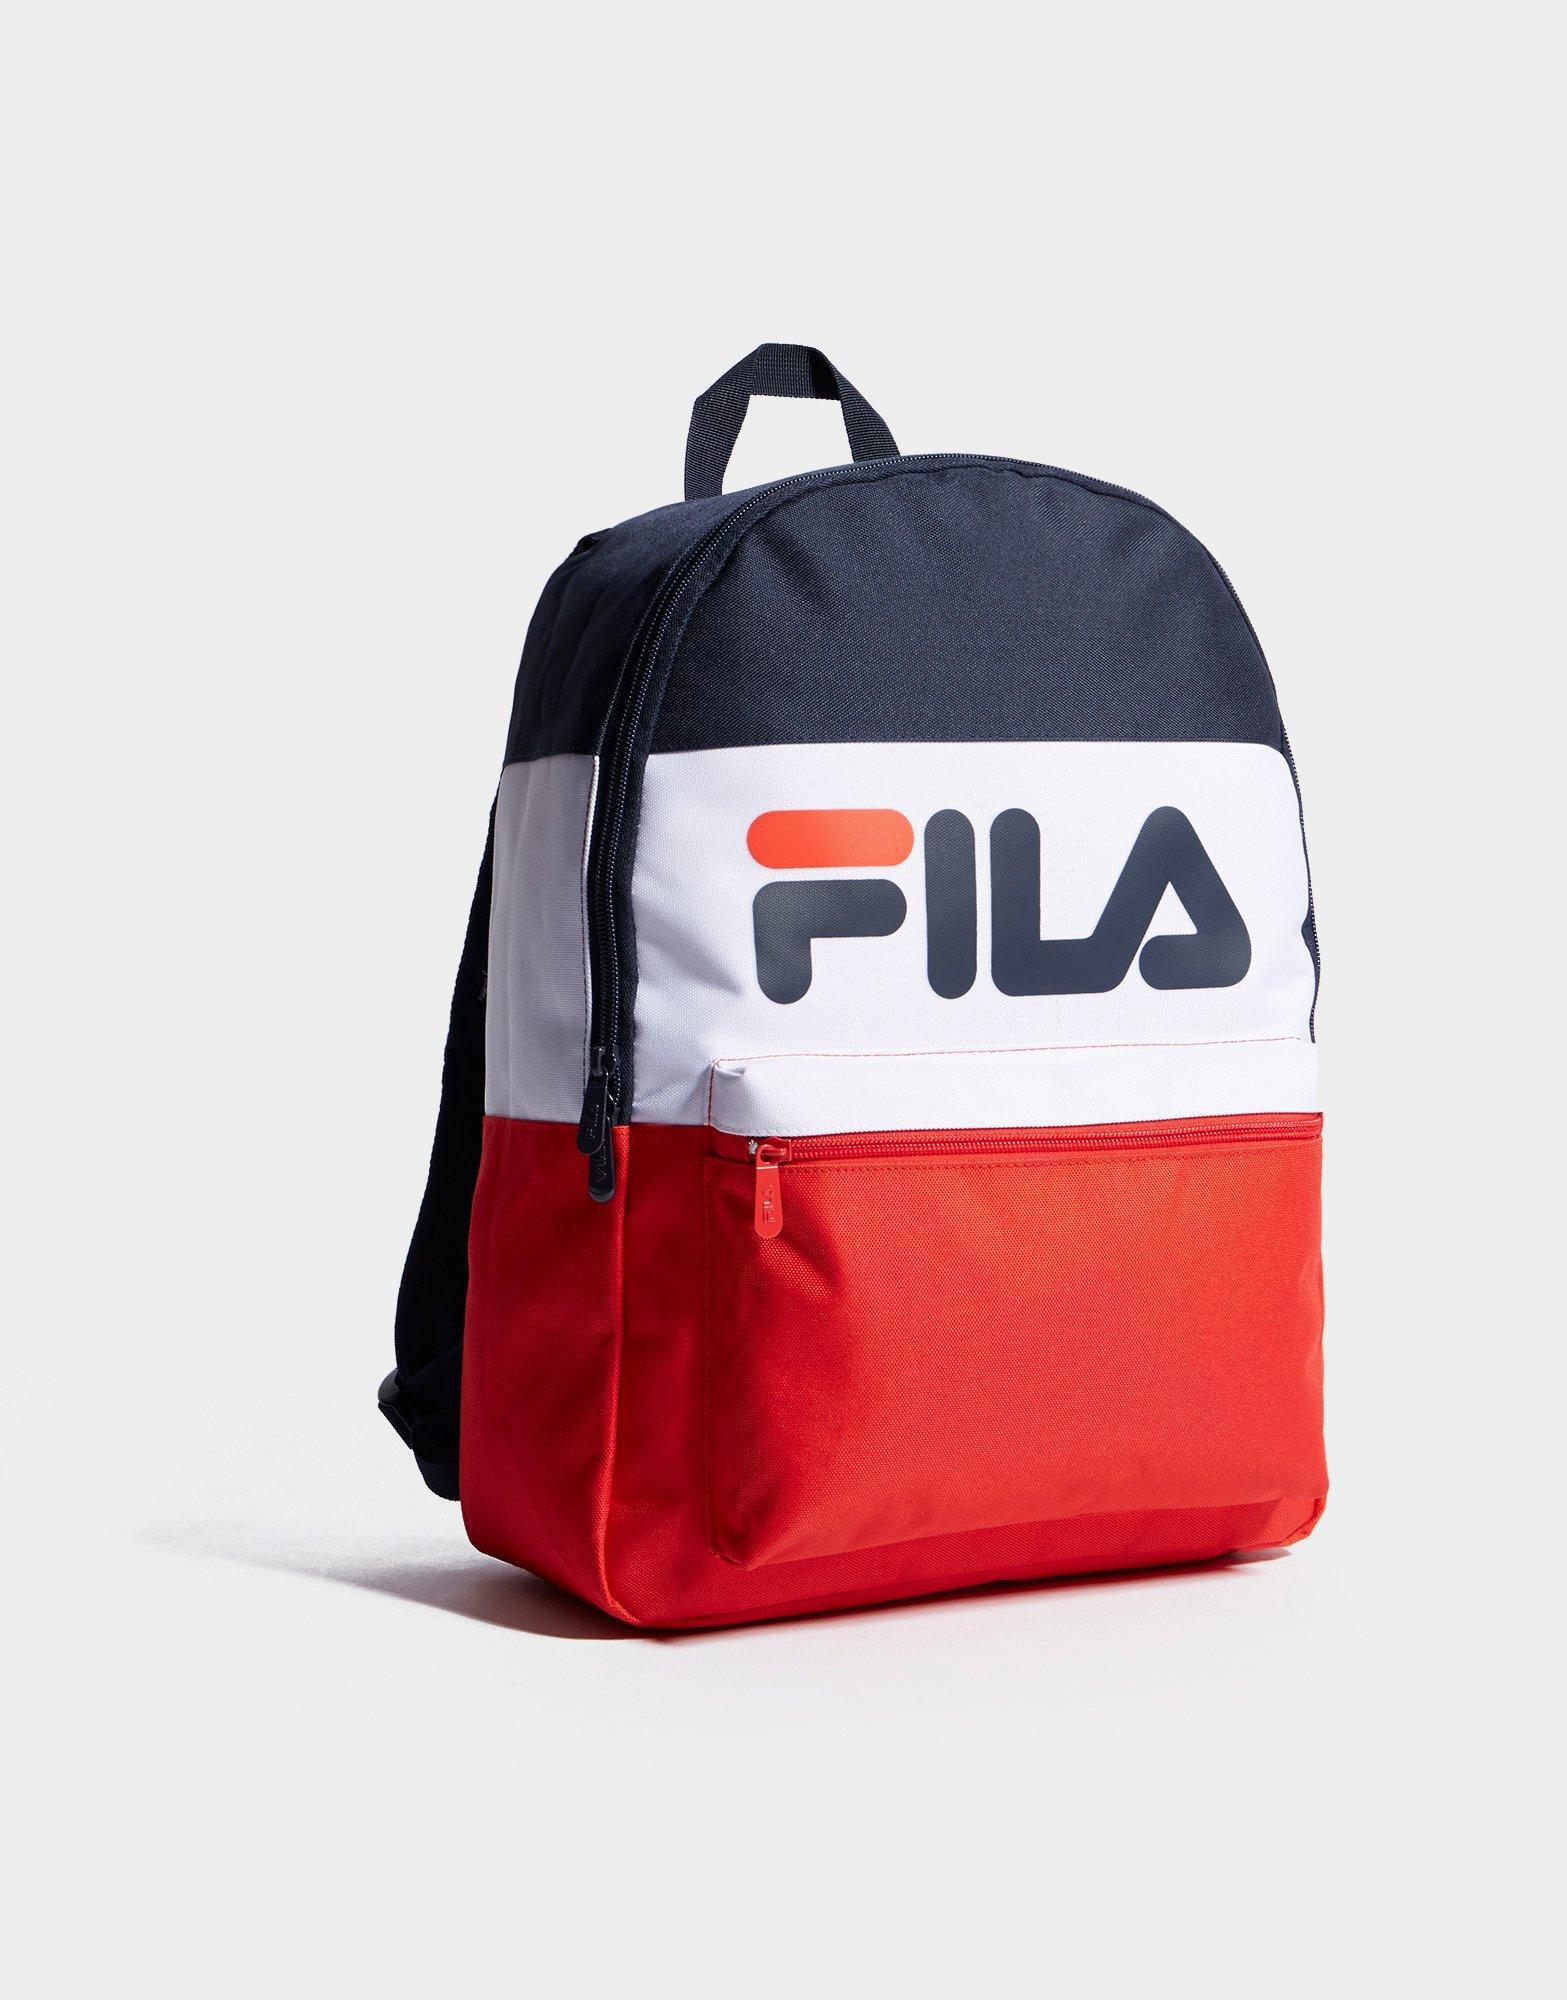 4f4de6ebb802 Lyst - Fila Vivian Backpack in Black for Men